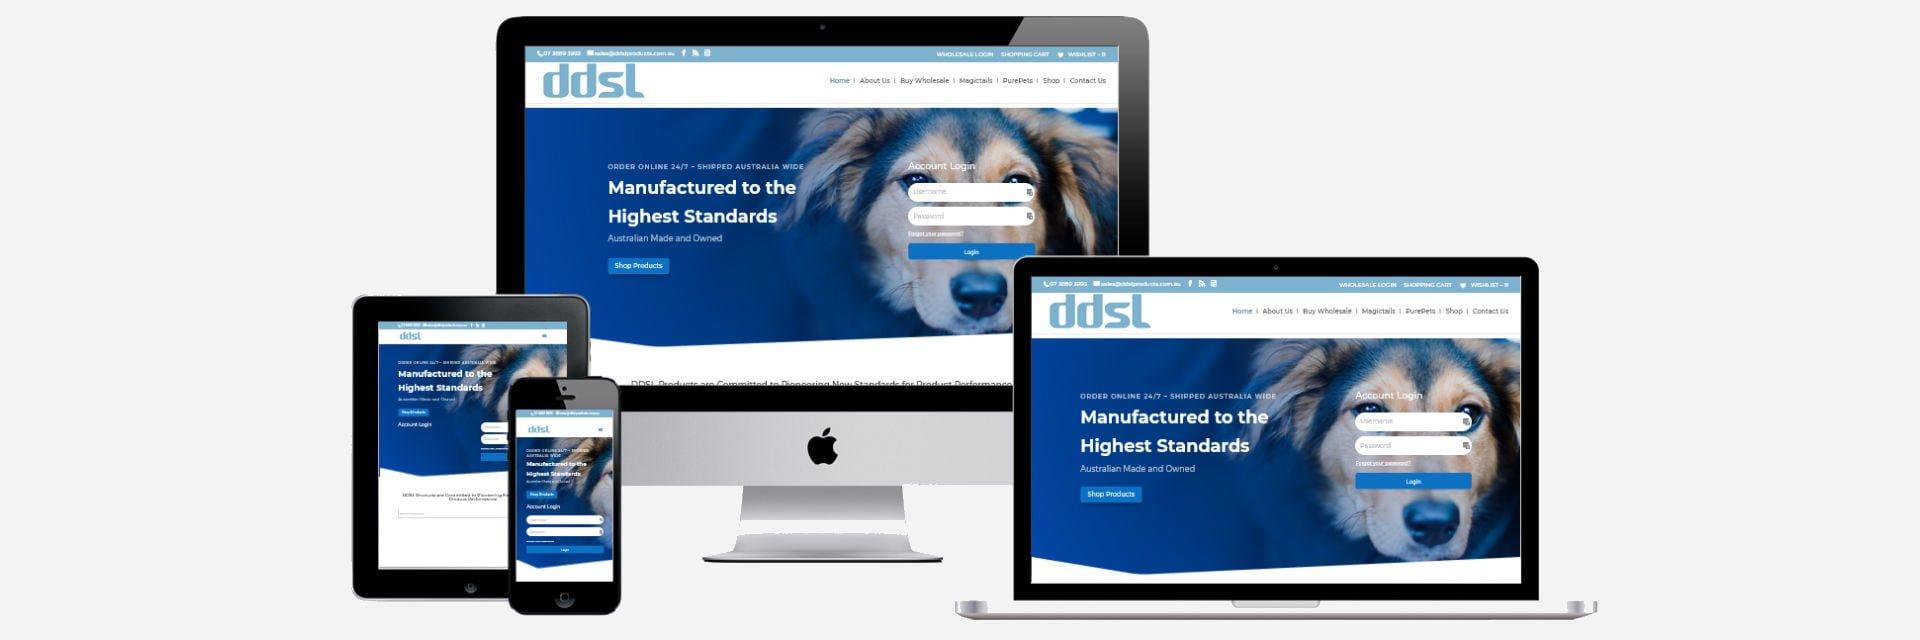 DDSL Products - New Website Design